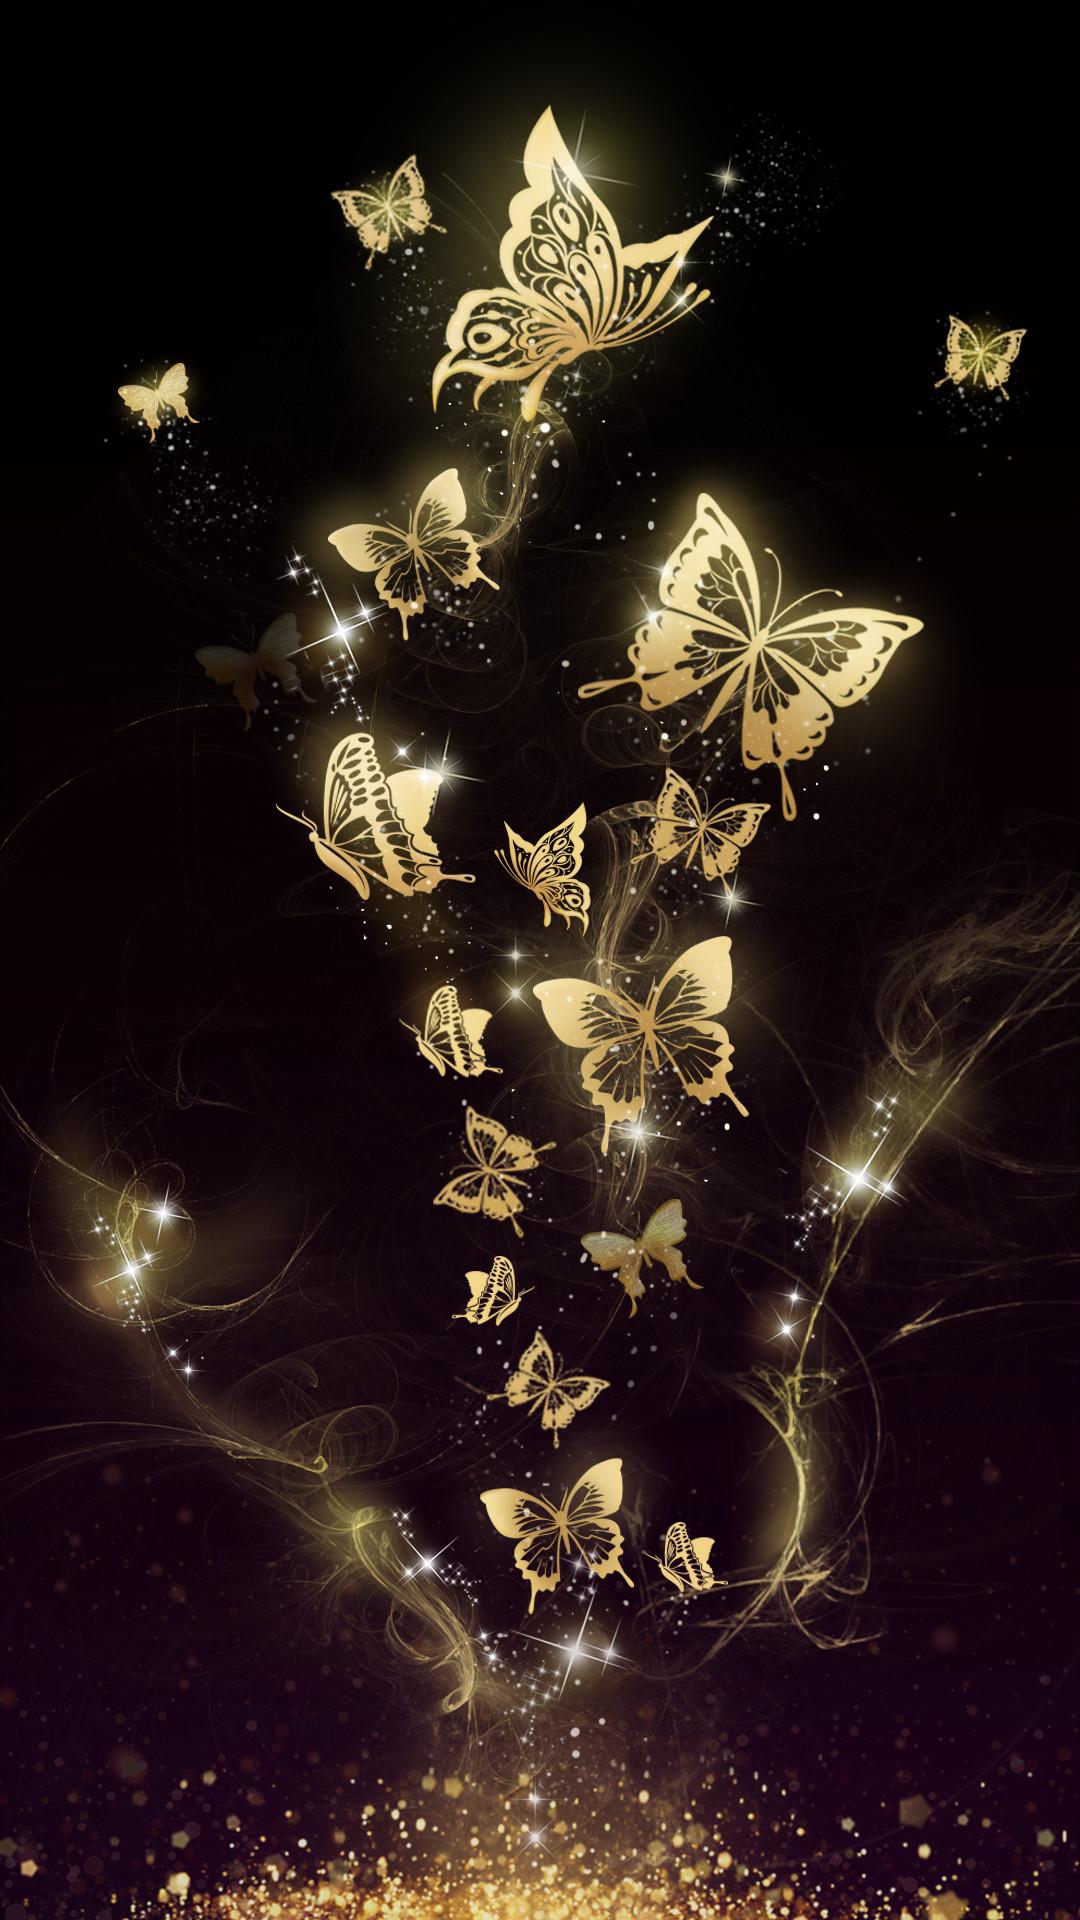 Aesthetic Butterfly Wallpaper Black